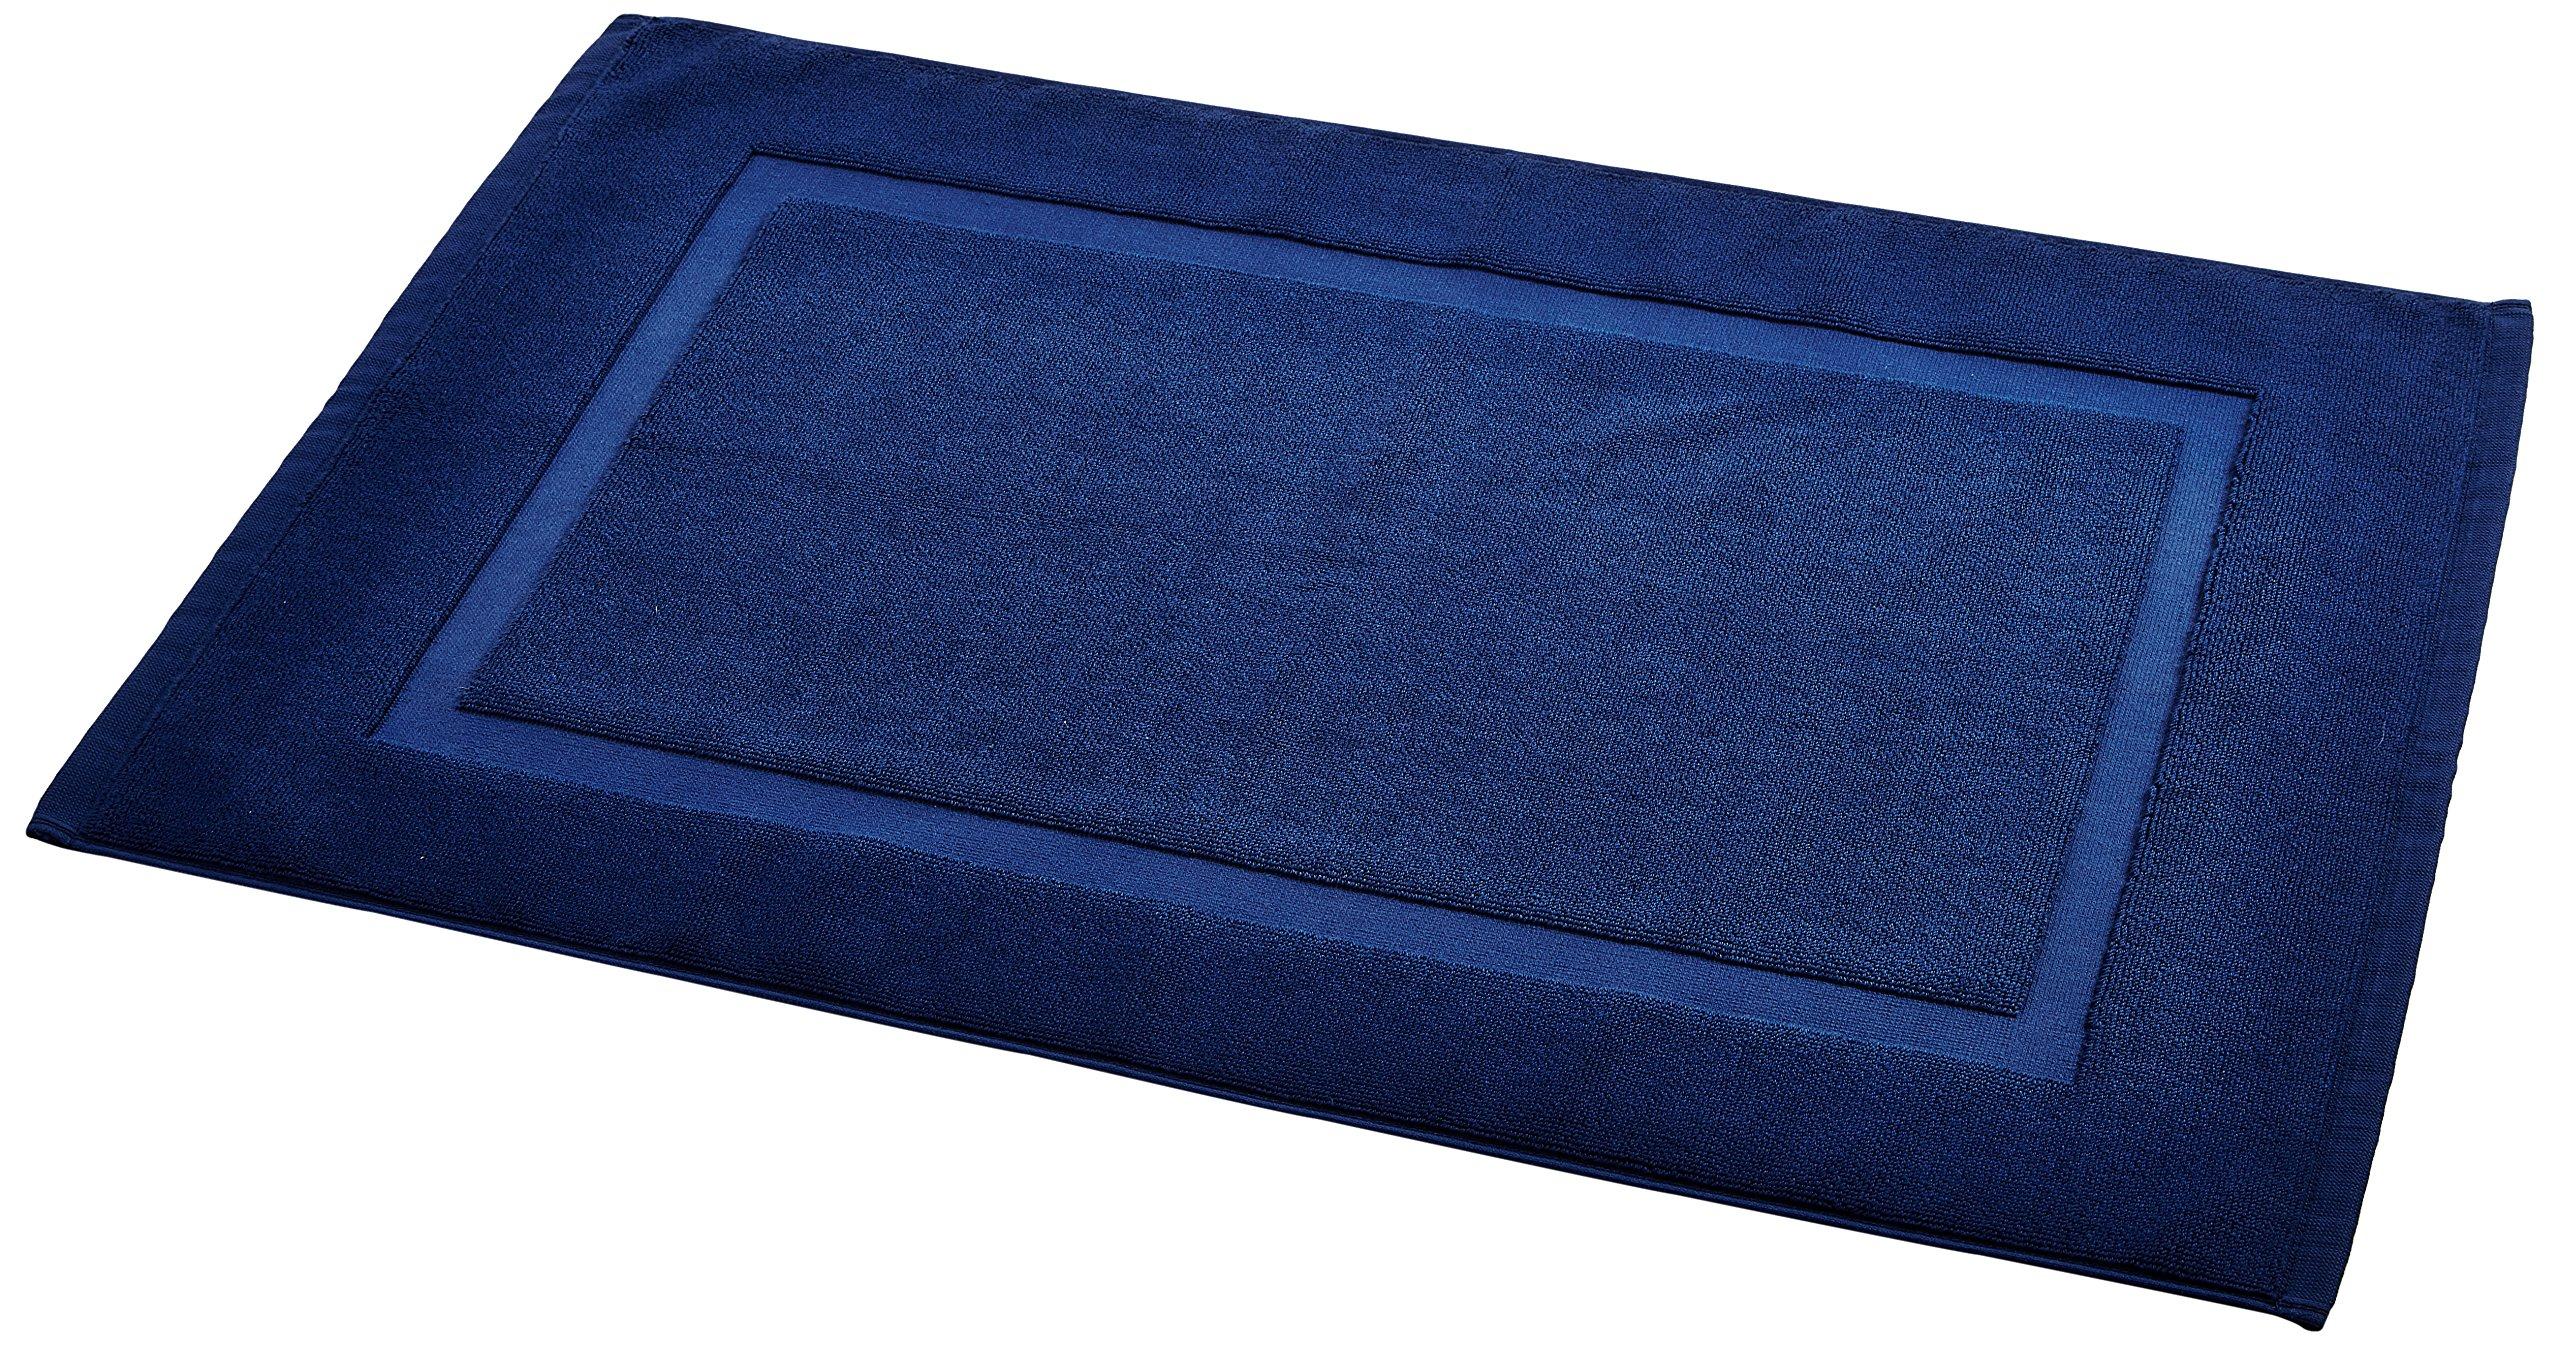 AmazonBasics Banded Bath Mat, Navy Blue by AmazonBasics